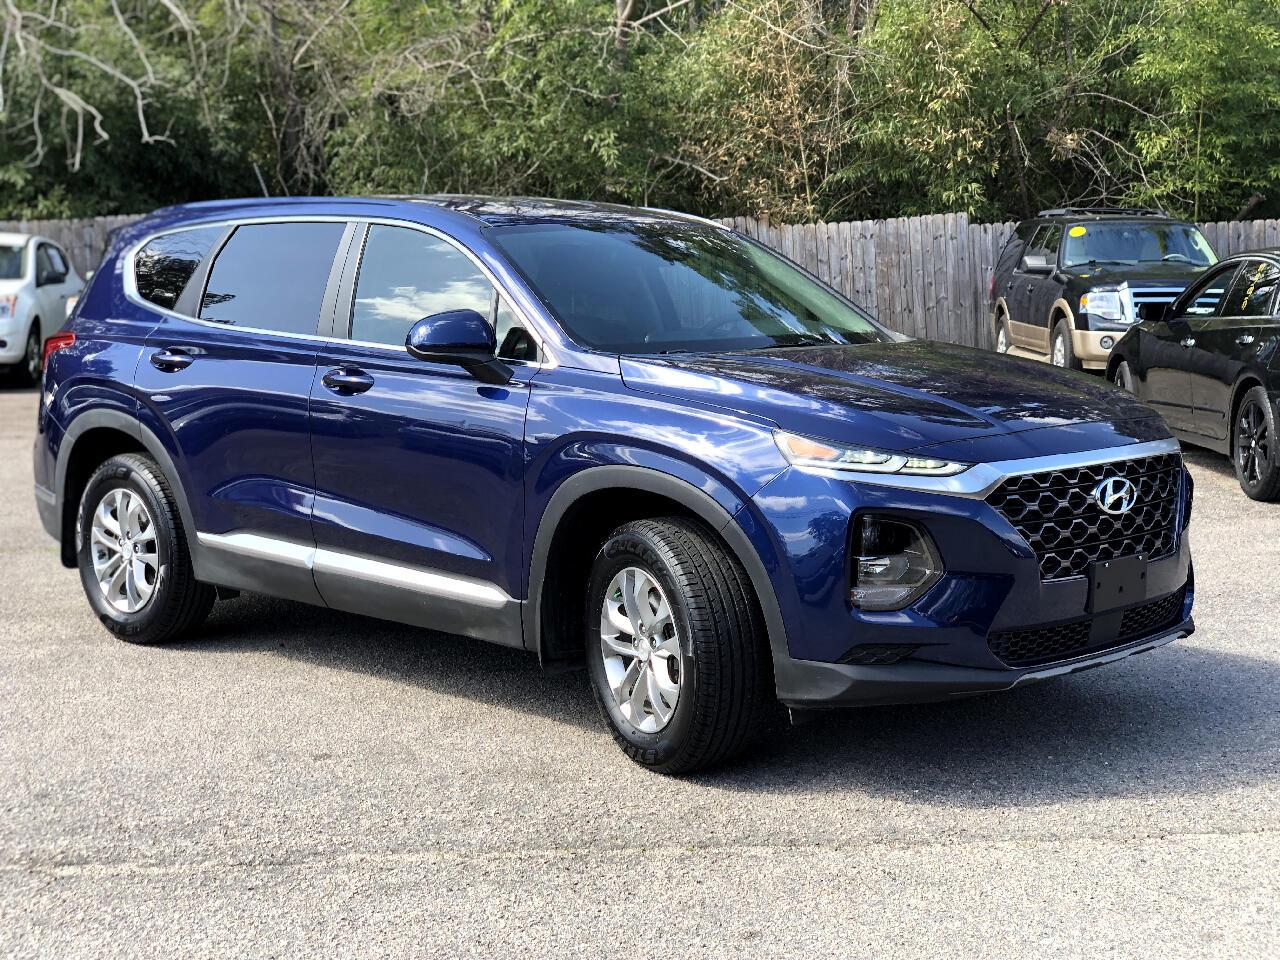 Hyundai Santa Fe SE 2.4L Auto FWD 2020